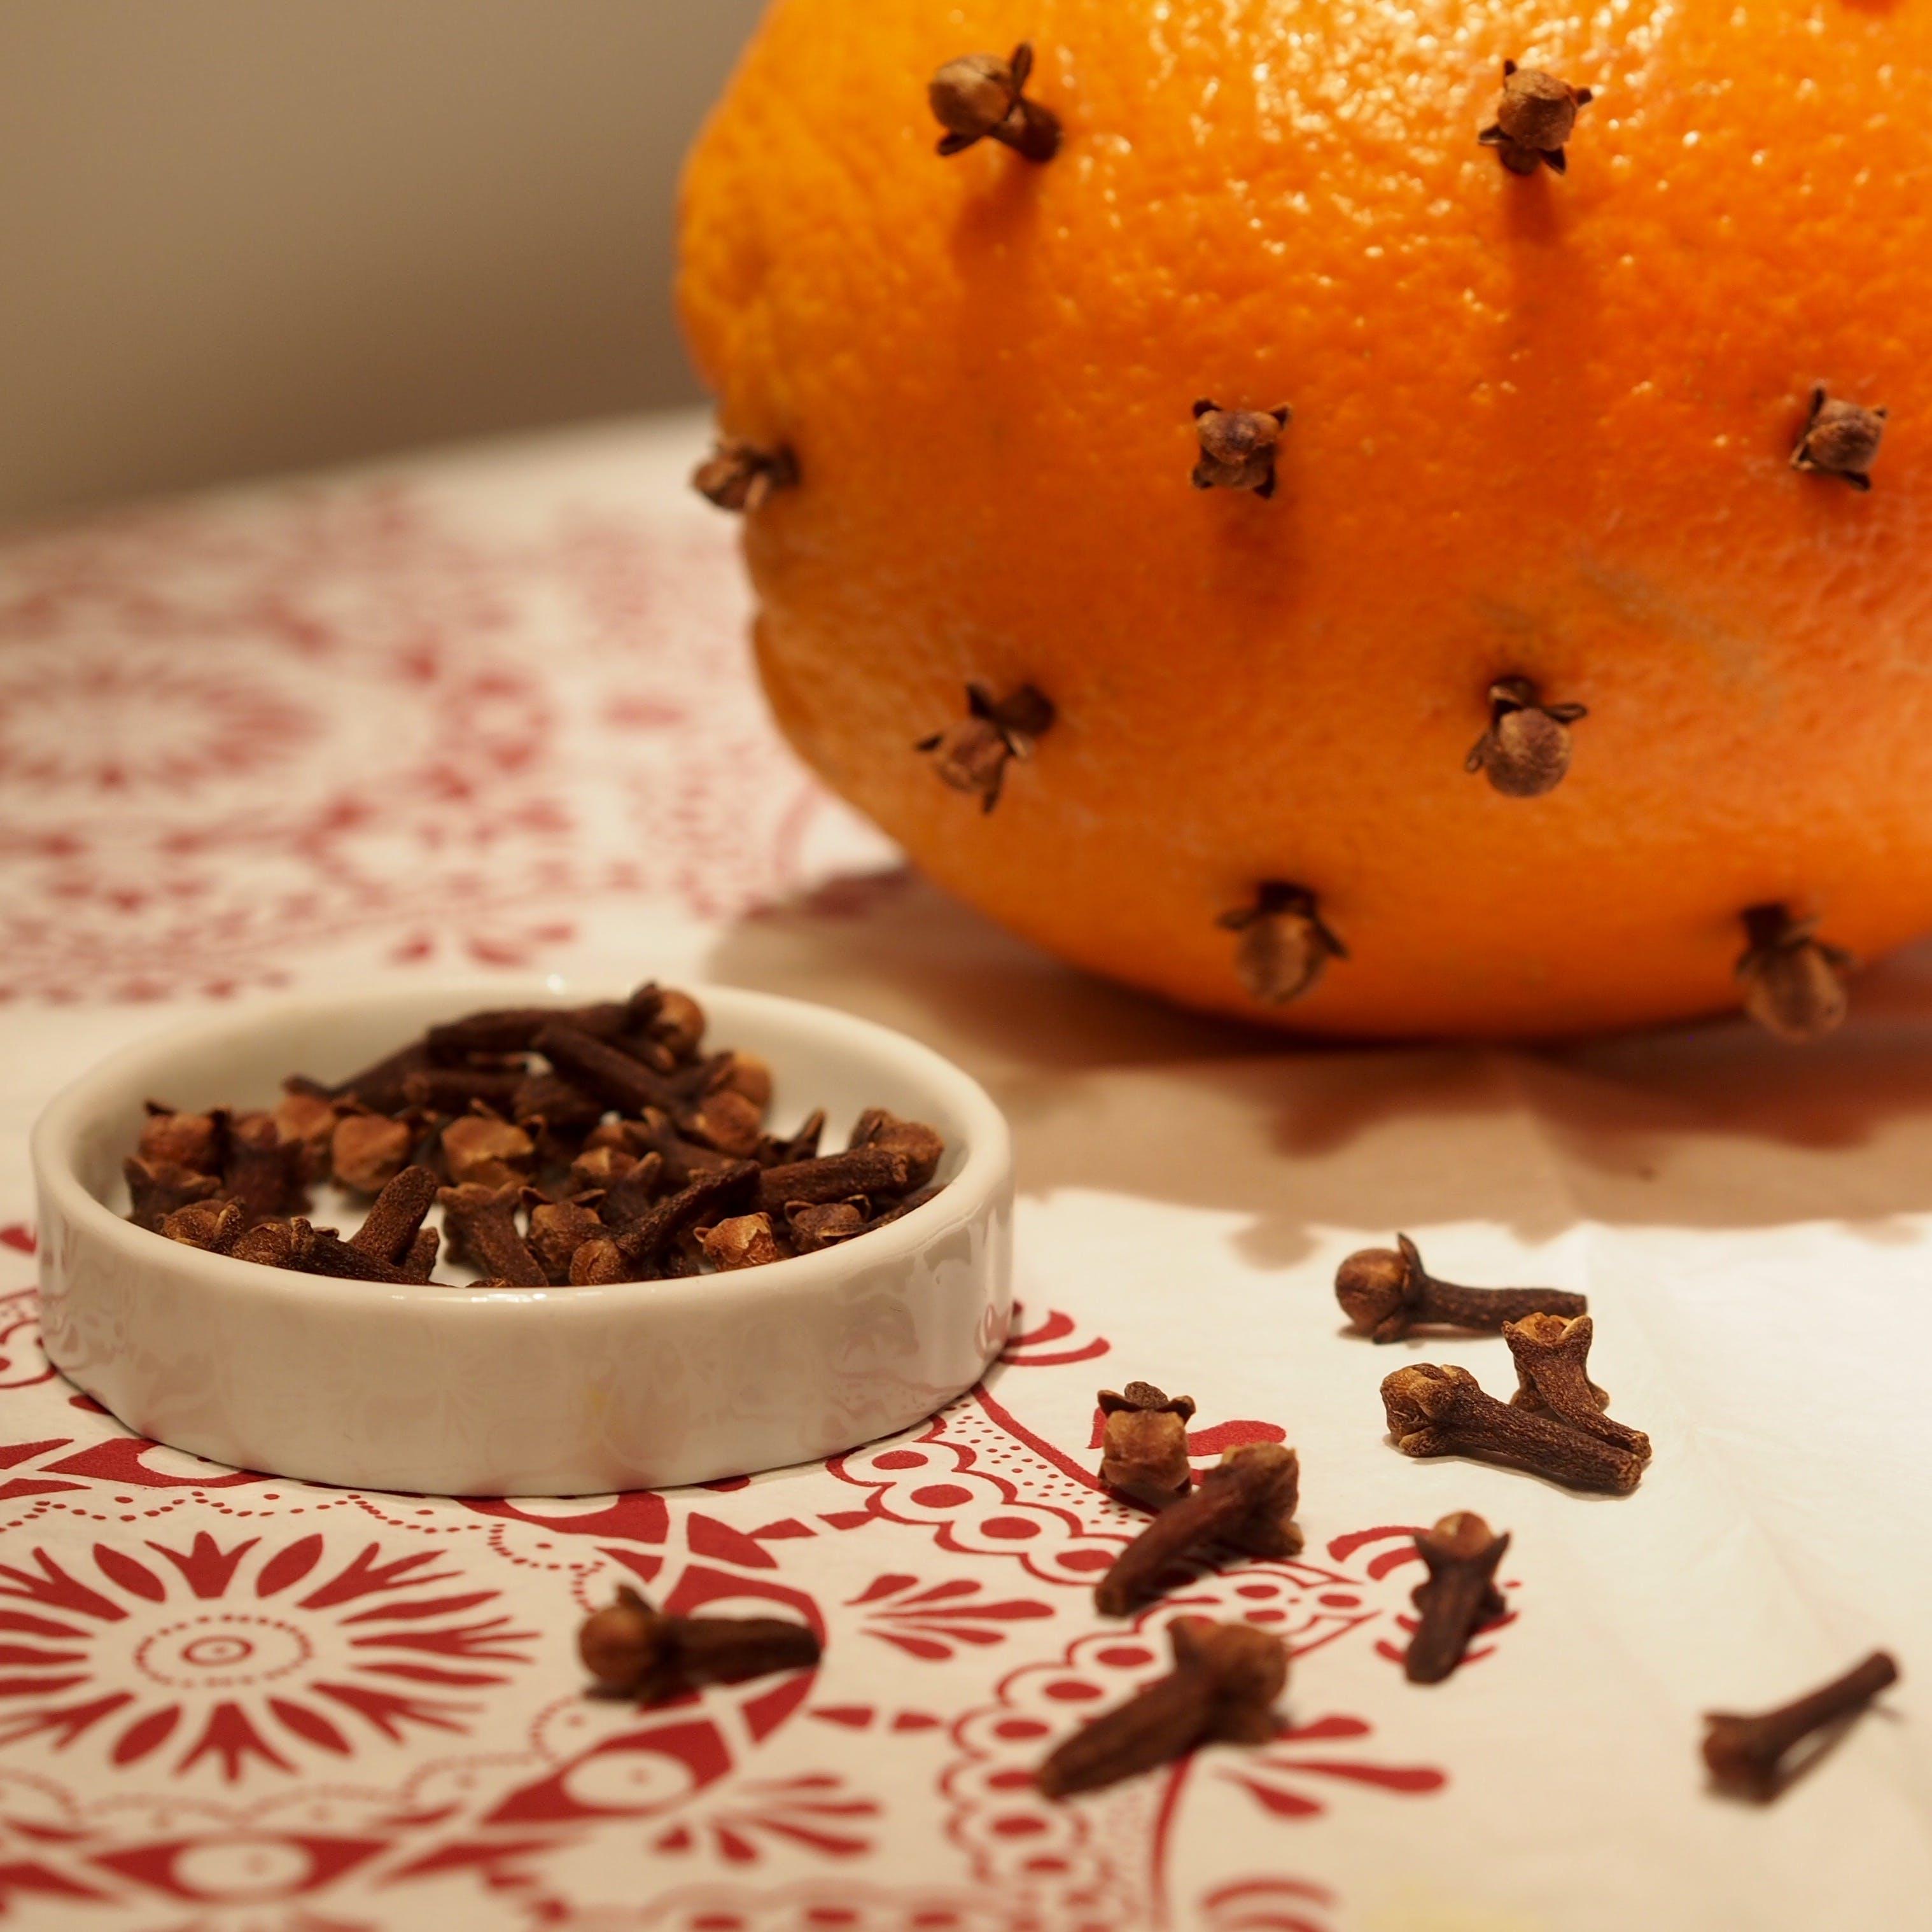 Free stock photo of orange, decoration, tradition, cloves